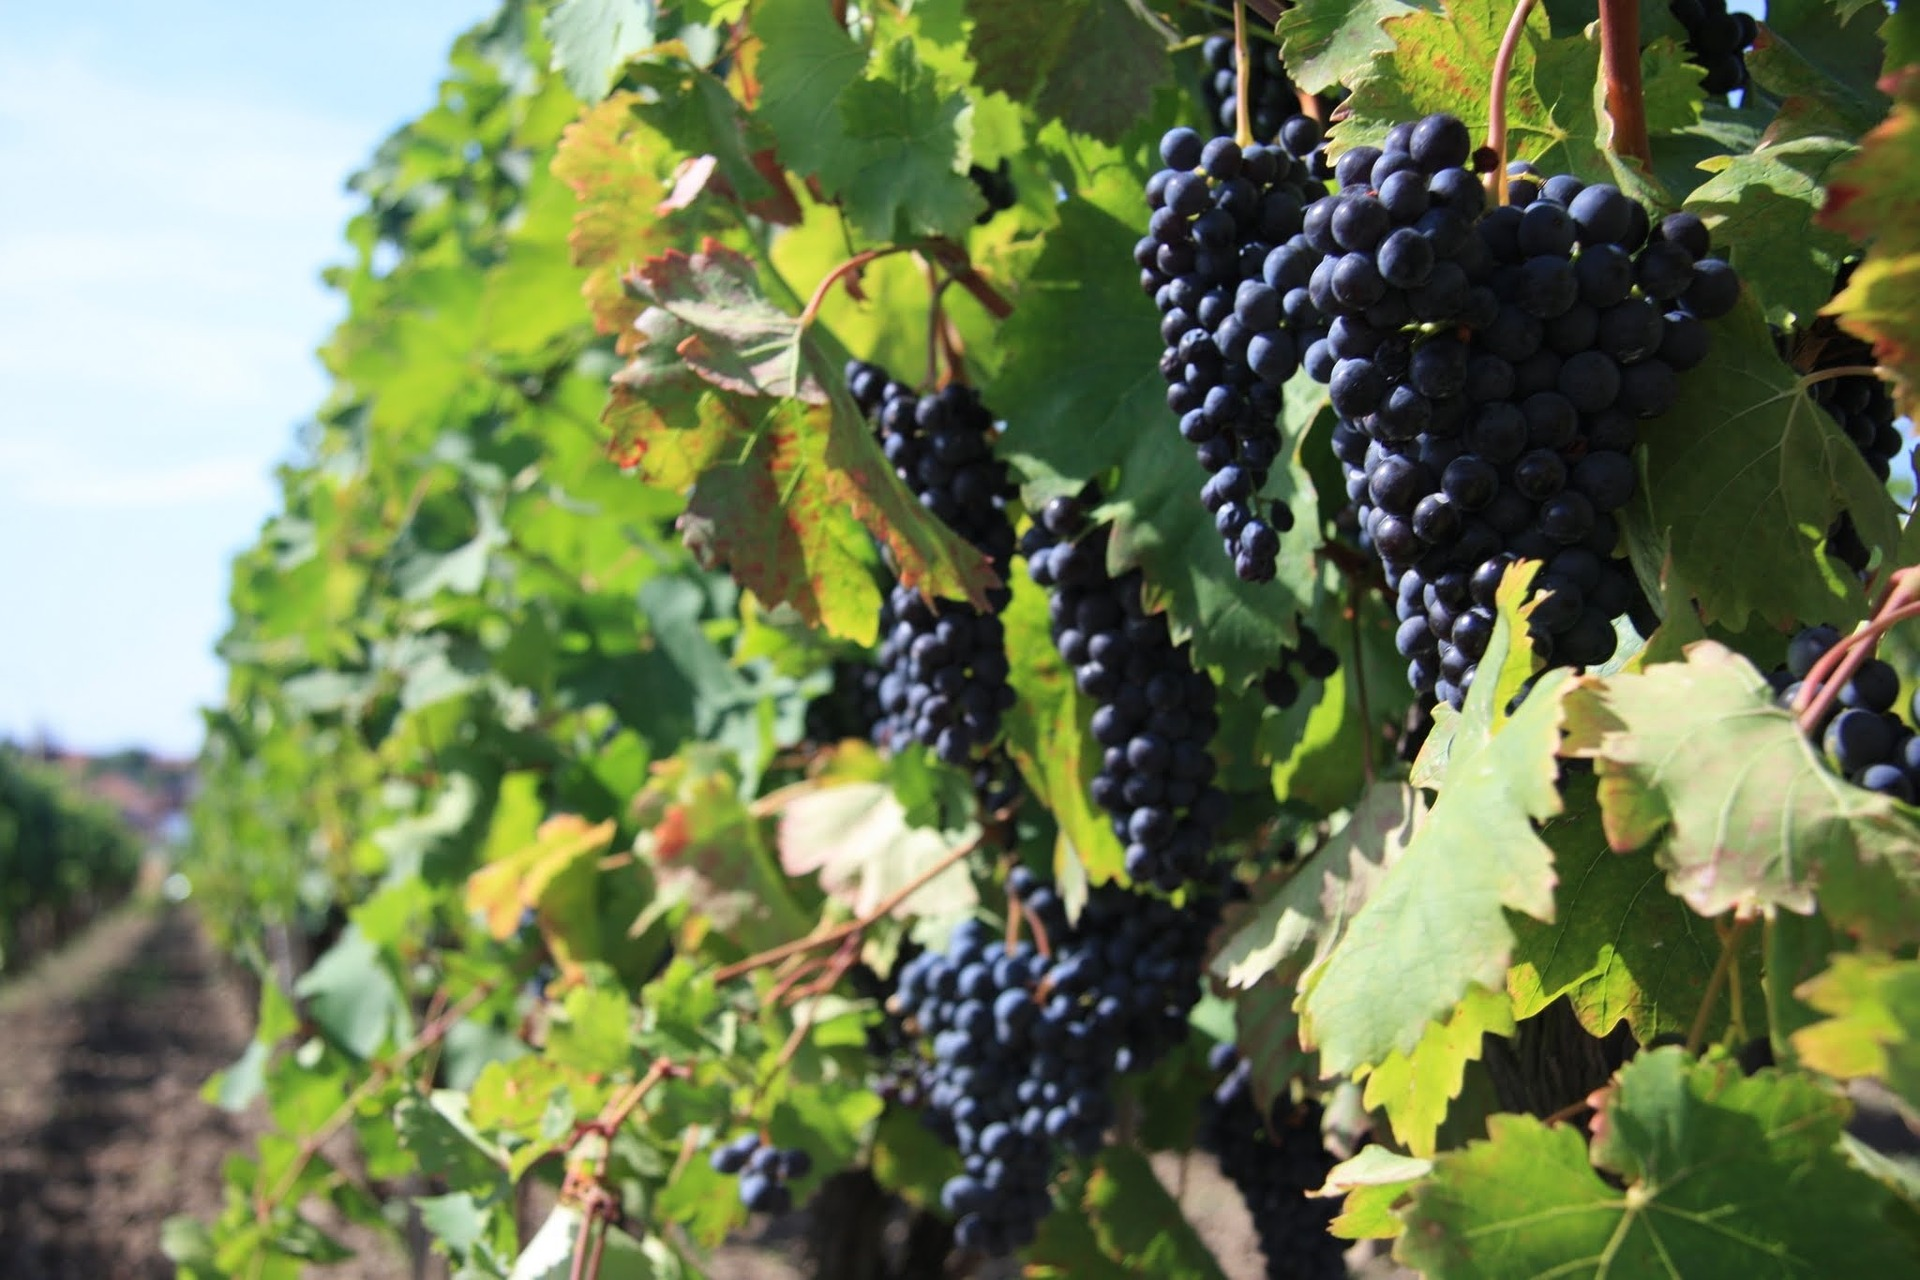 Dark purple grapes ripening on the vine.